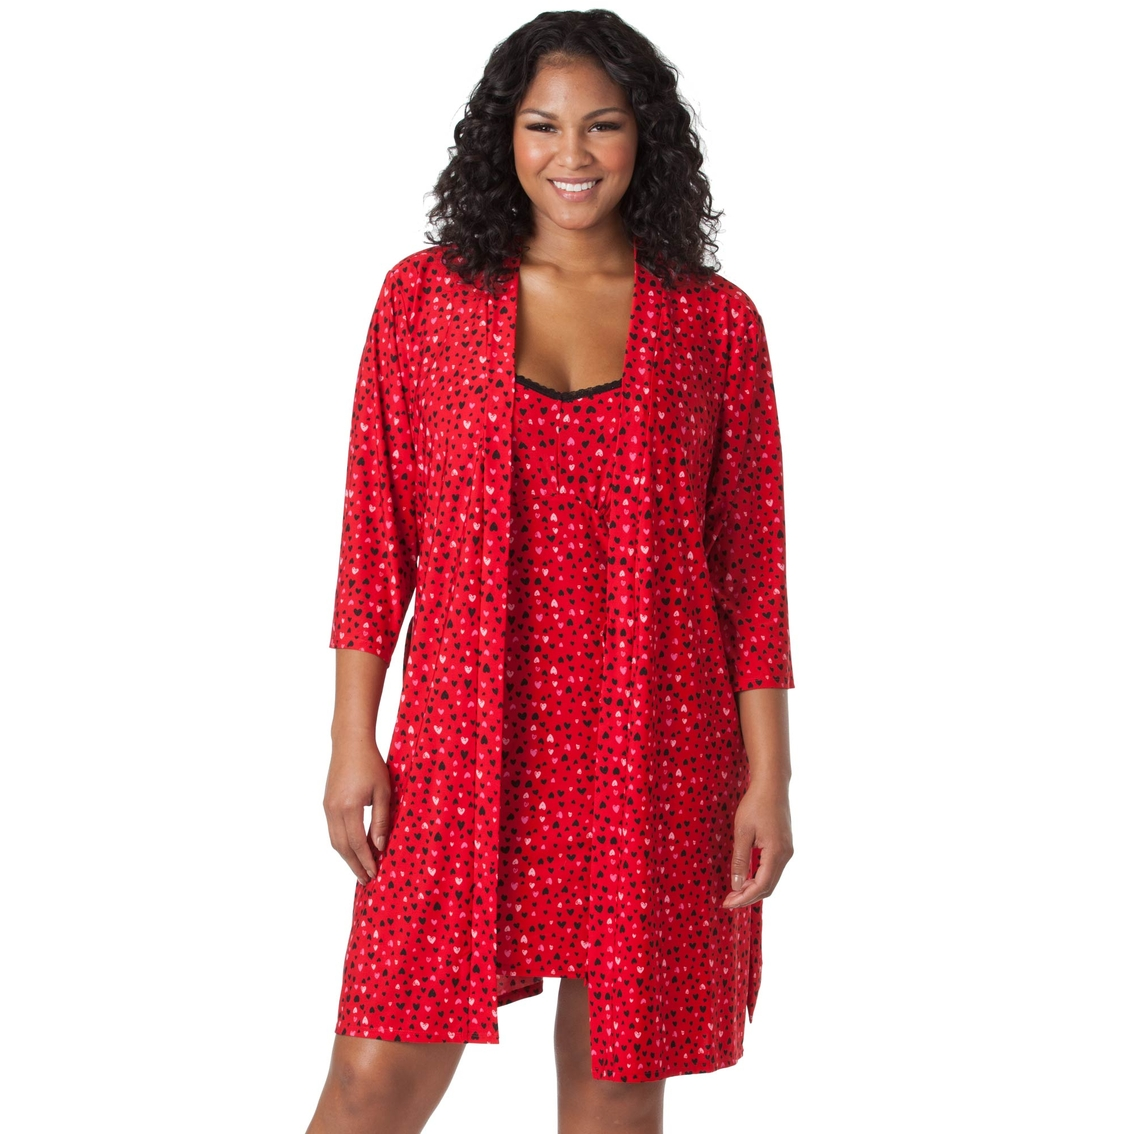 b44ca7ad4 Rene Rofe Plus Size Lace Me Up 2 Pc. Robe And Chemise Set   Pajamas ...